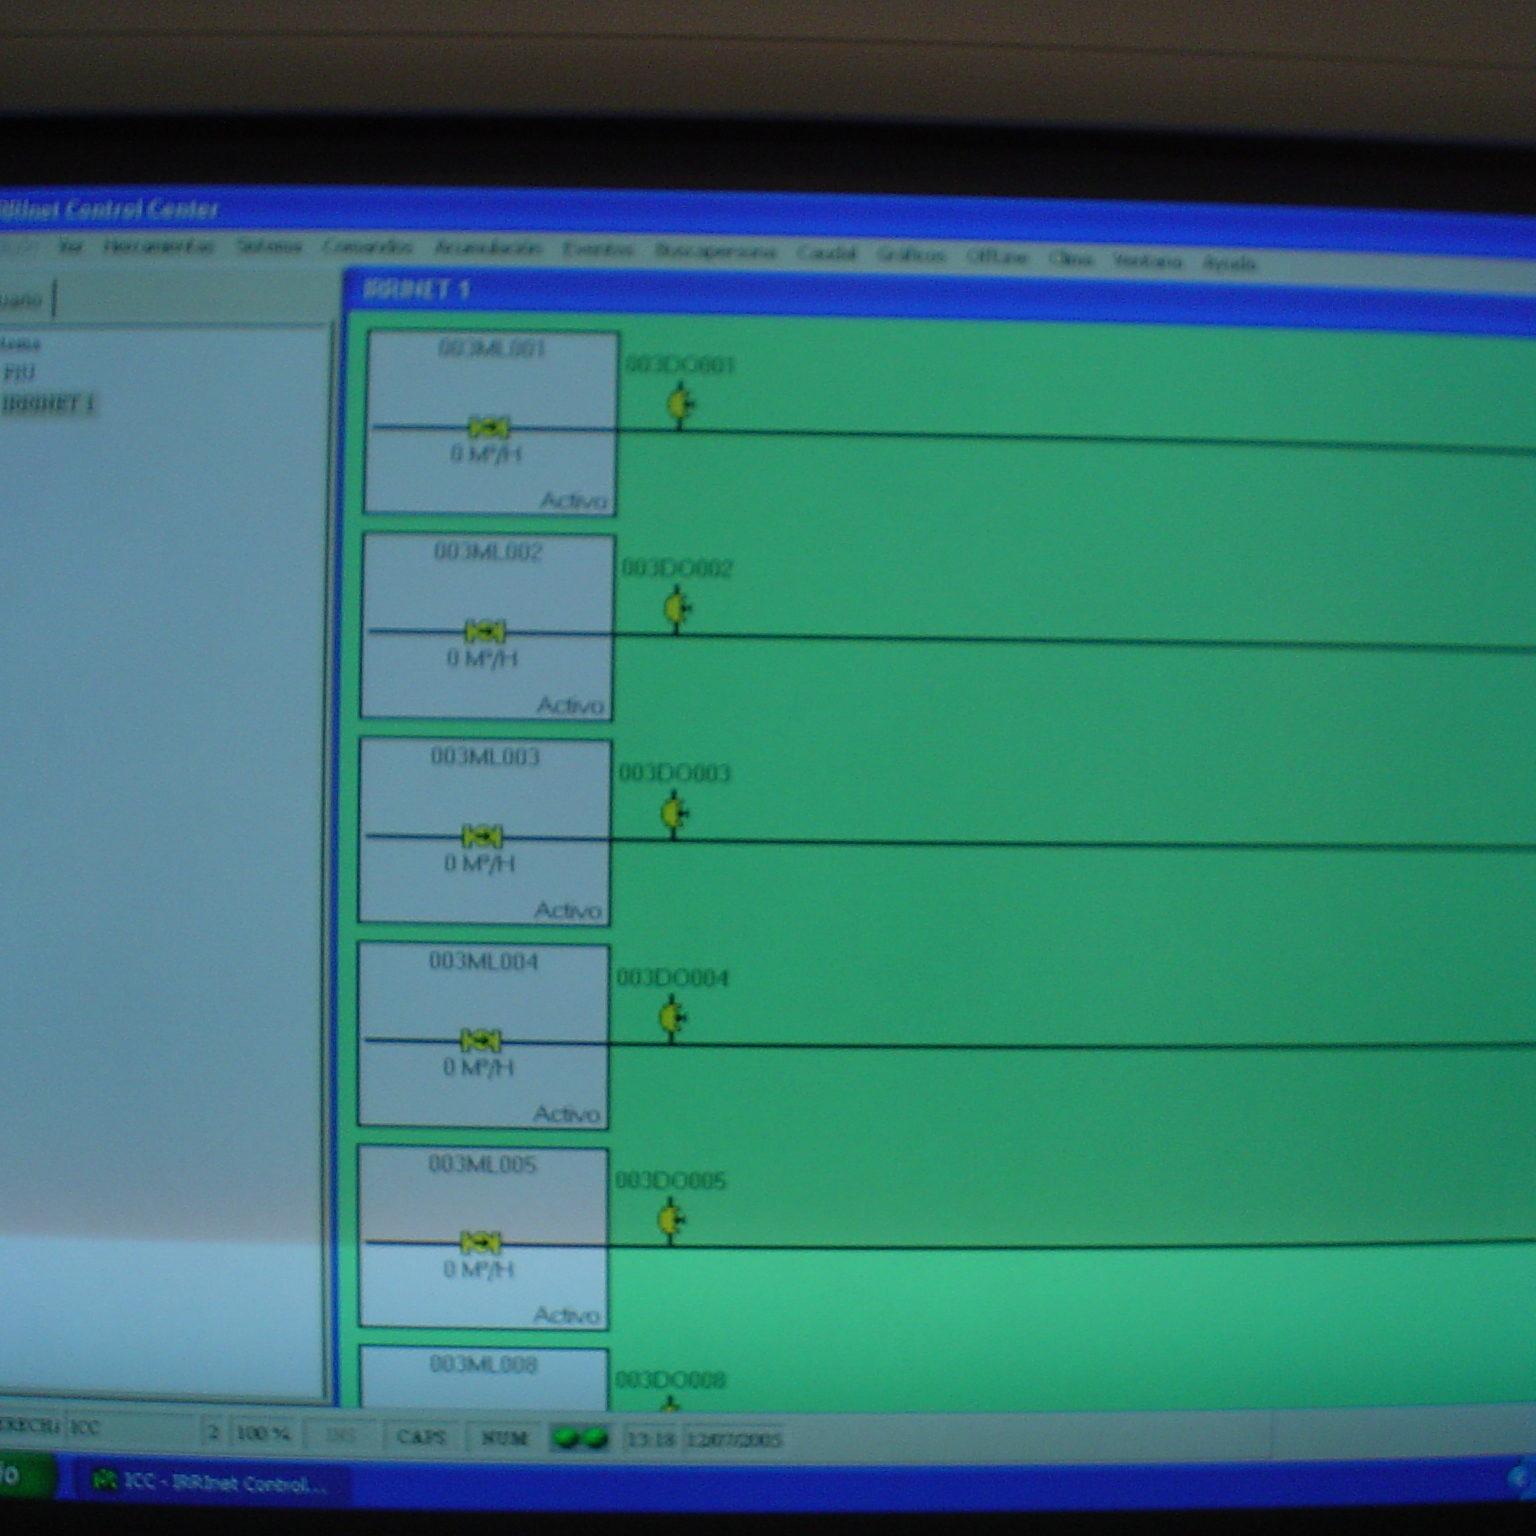 pantalla de control